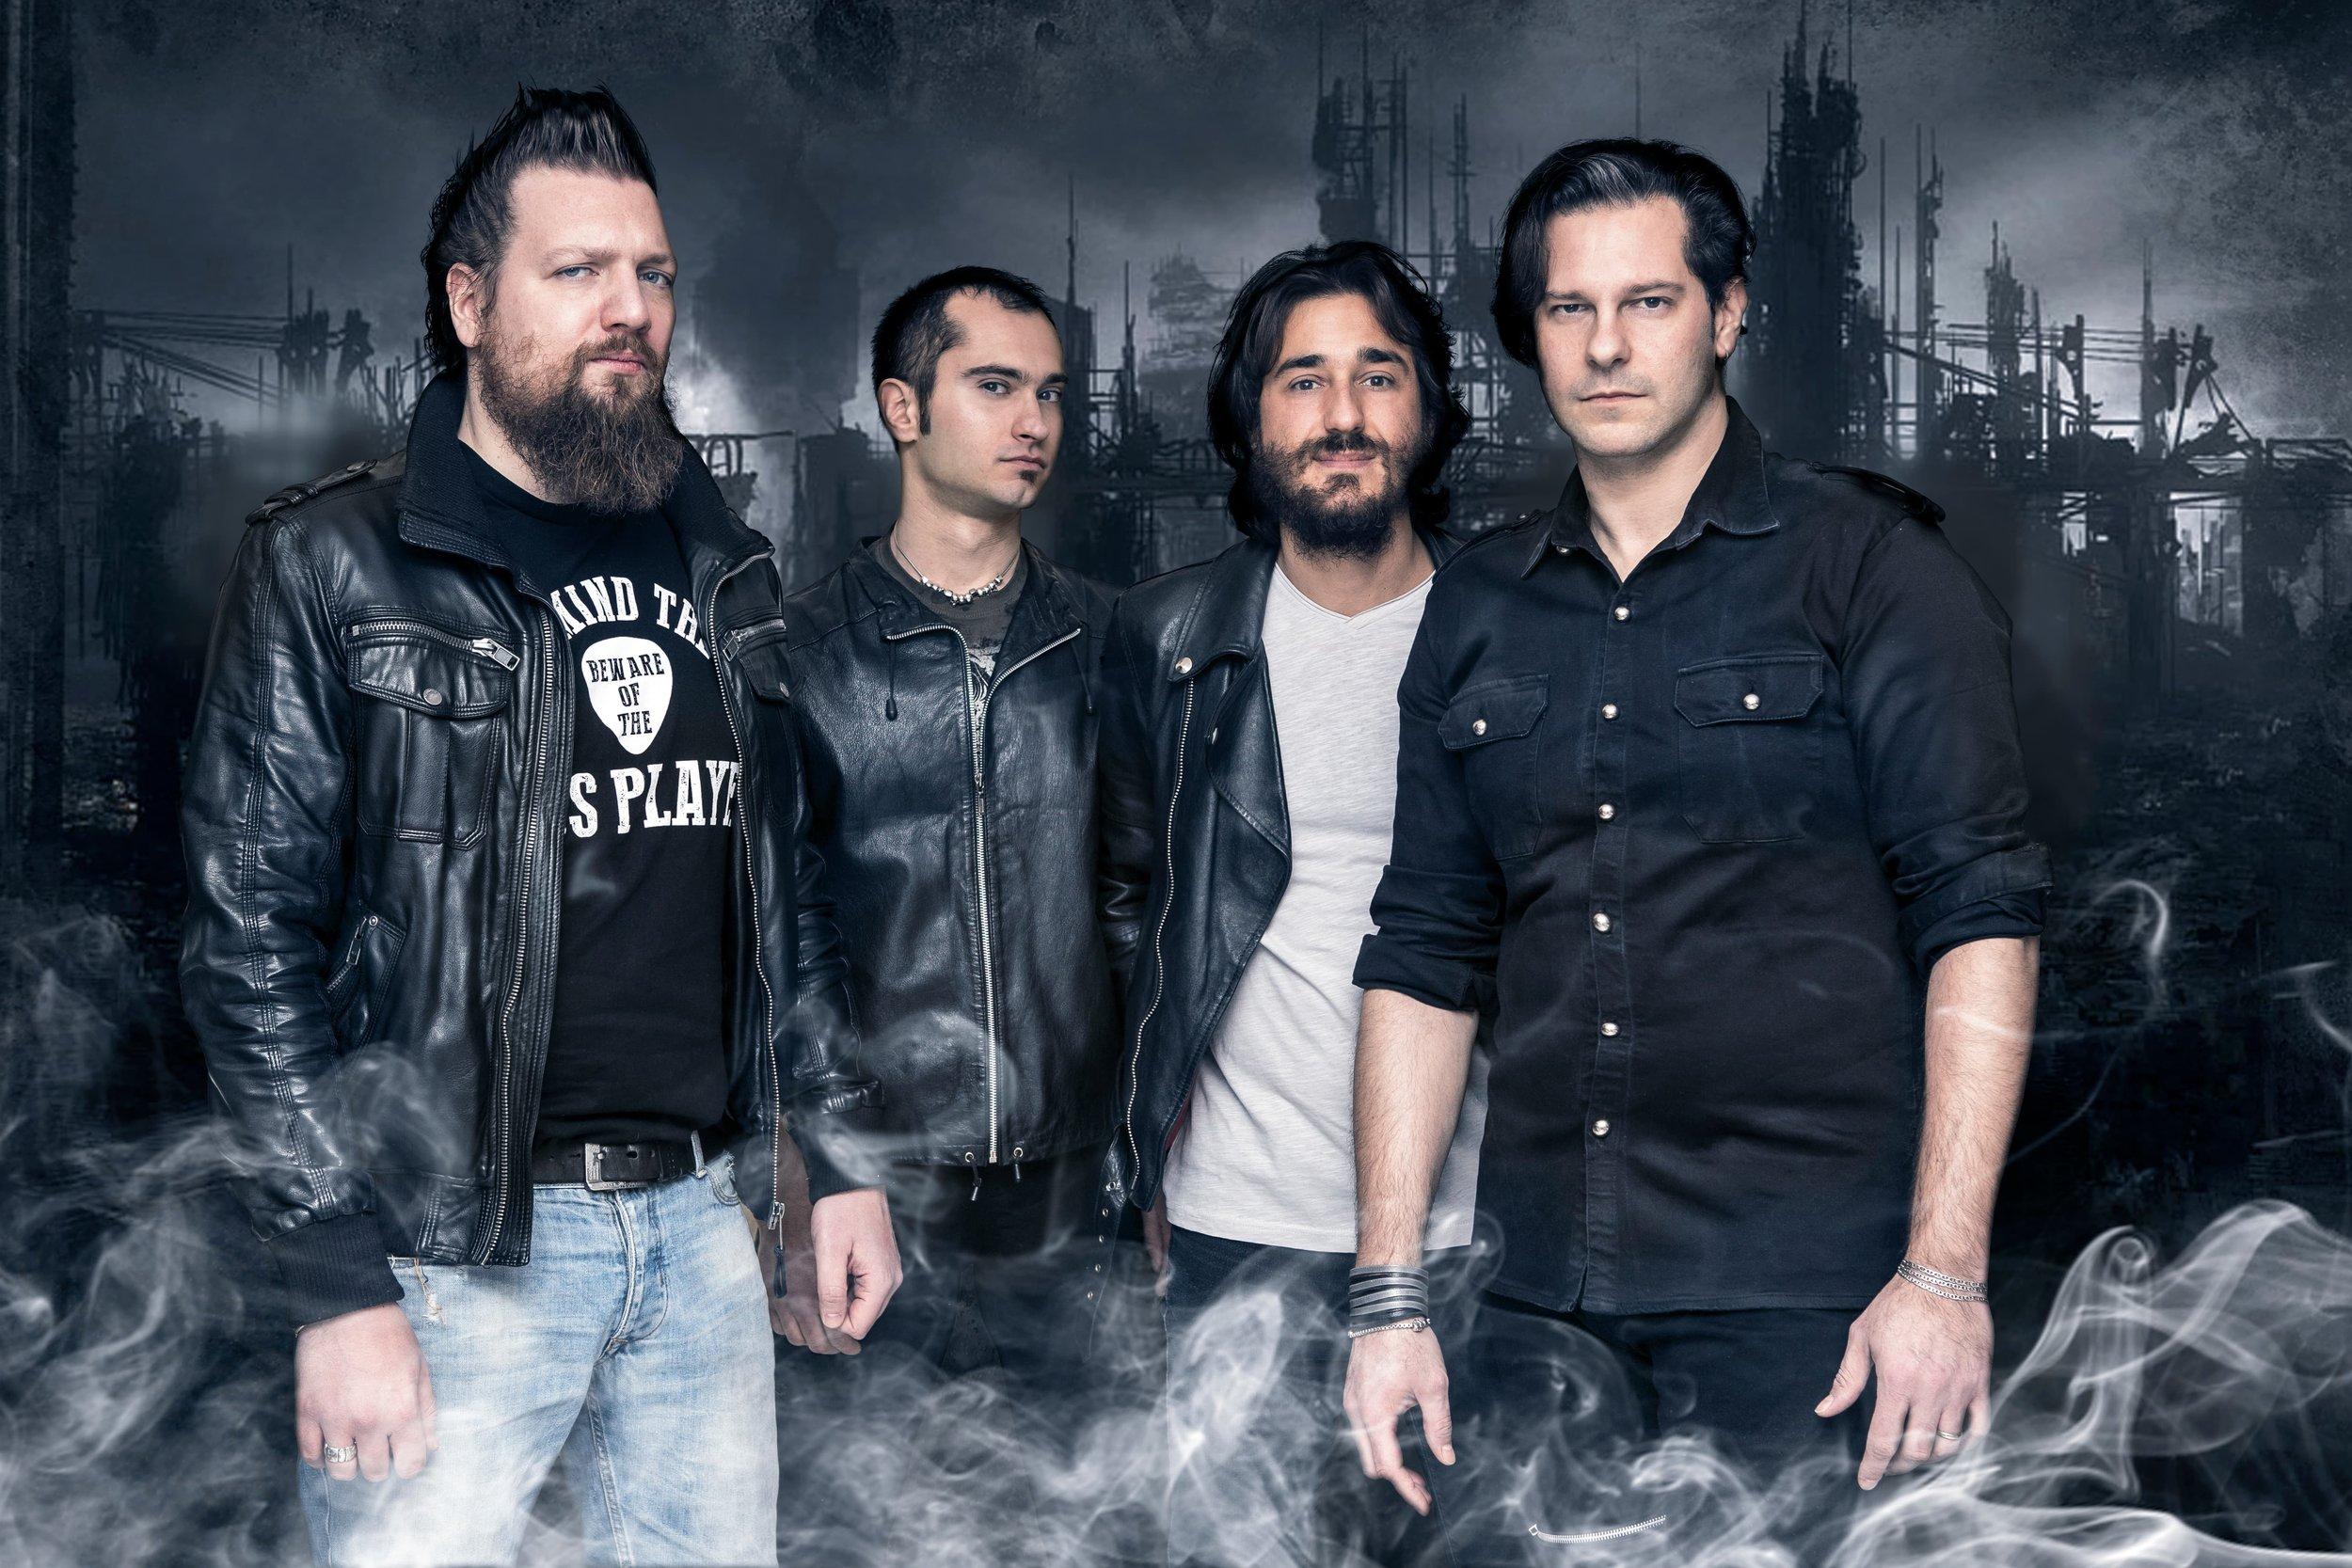 artwork compositing per heavy metal band